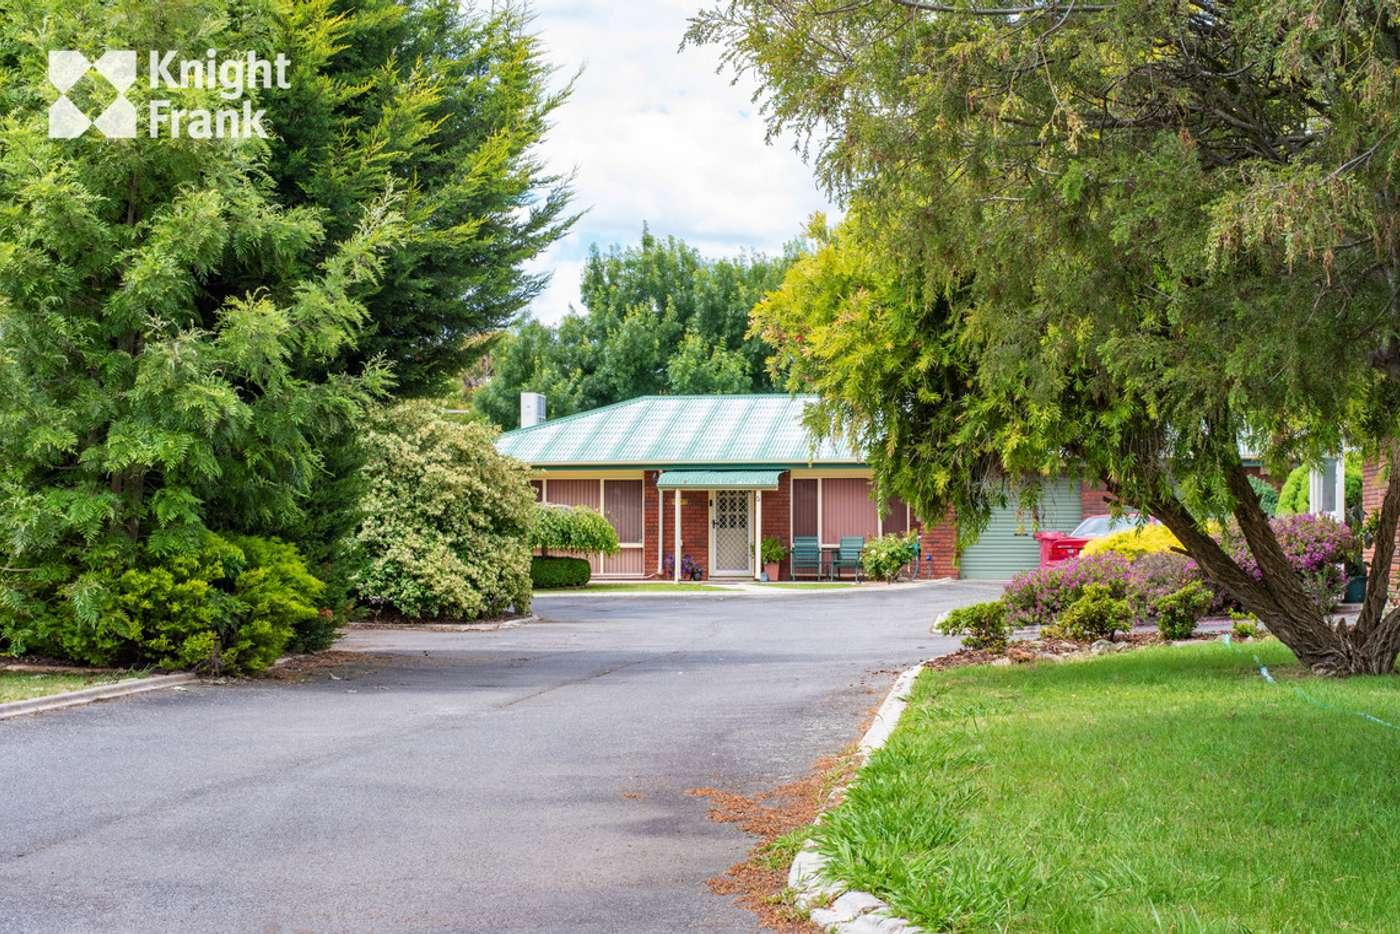 Main view of Homely house listing, 5/22 Calais Street, Mowbray TAS 7248